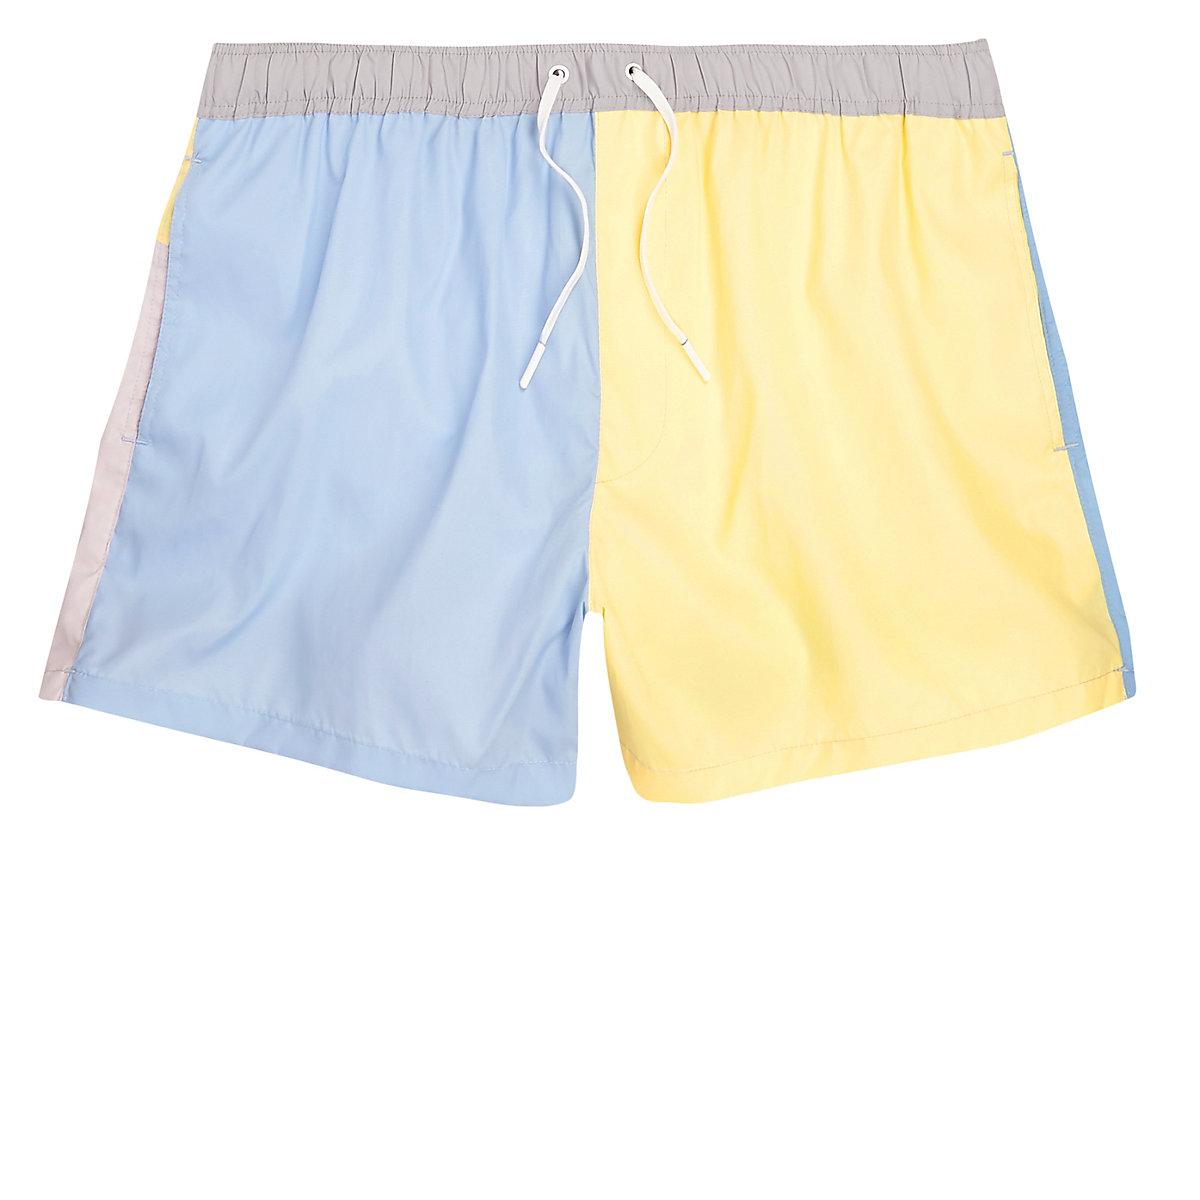 Light blue block color swim trunks